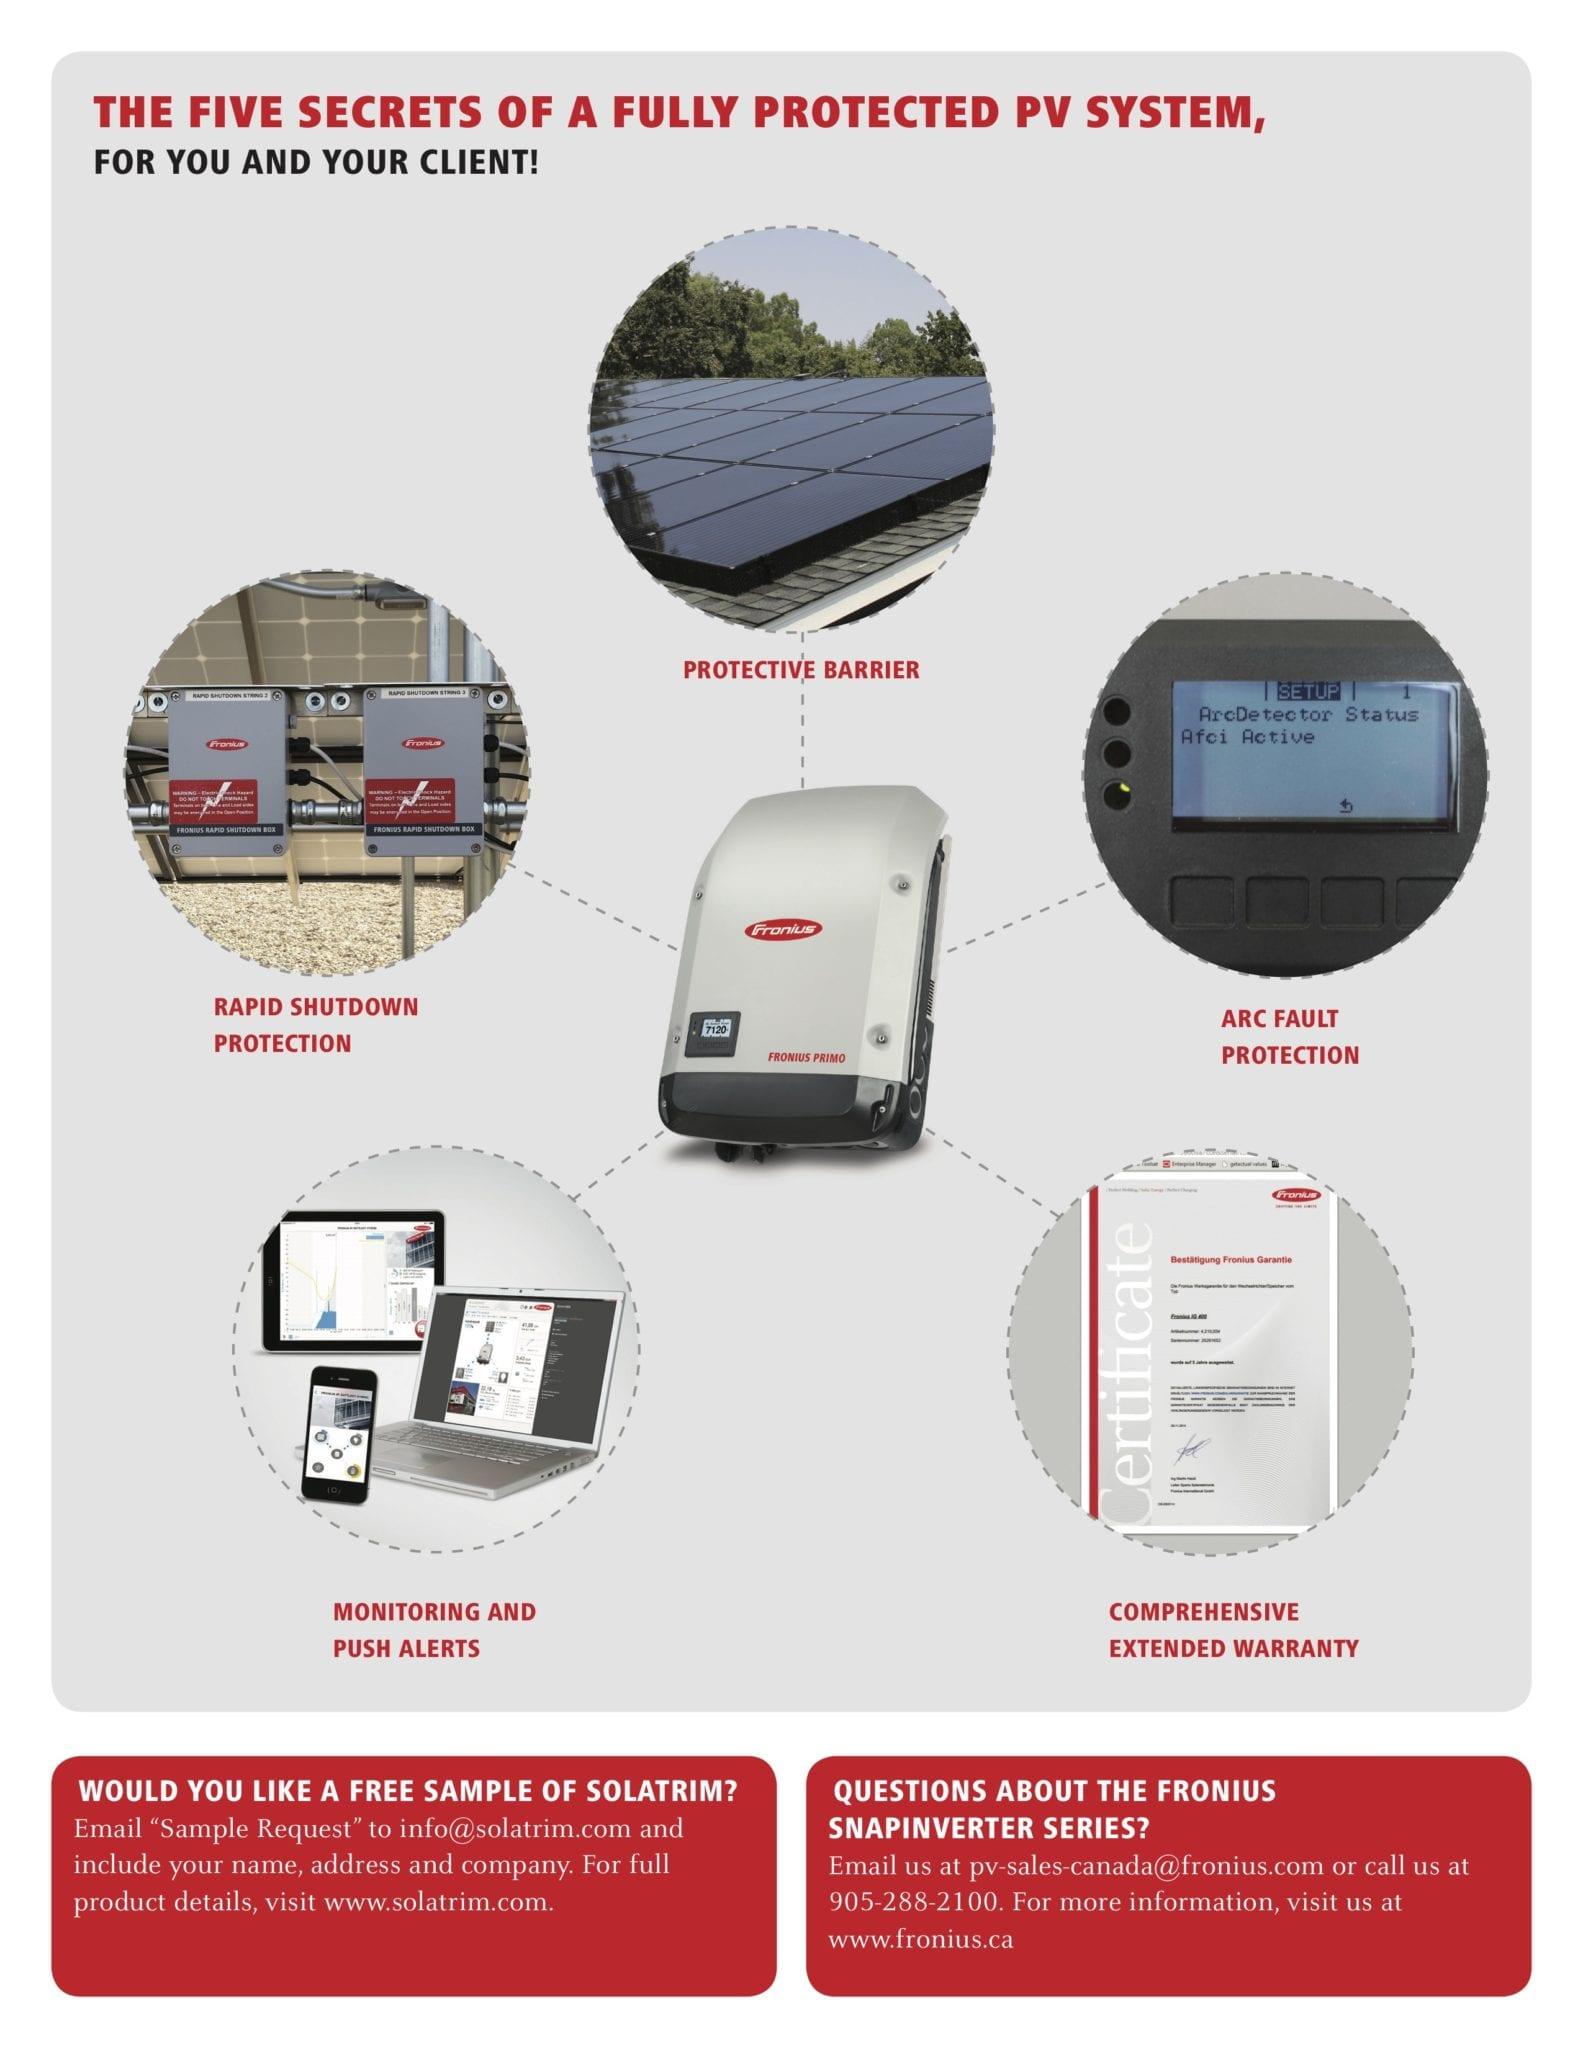 Fronius Solar Panel Rodent Protection Case Study Solatrim